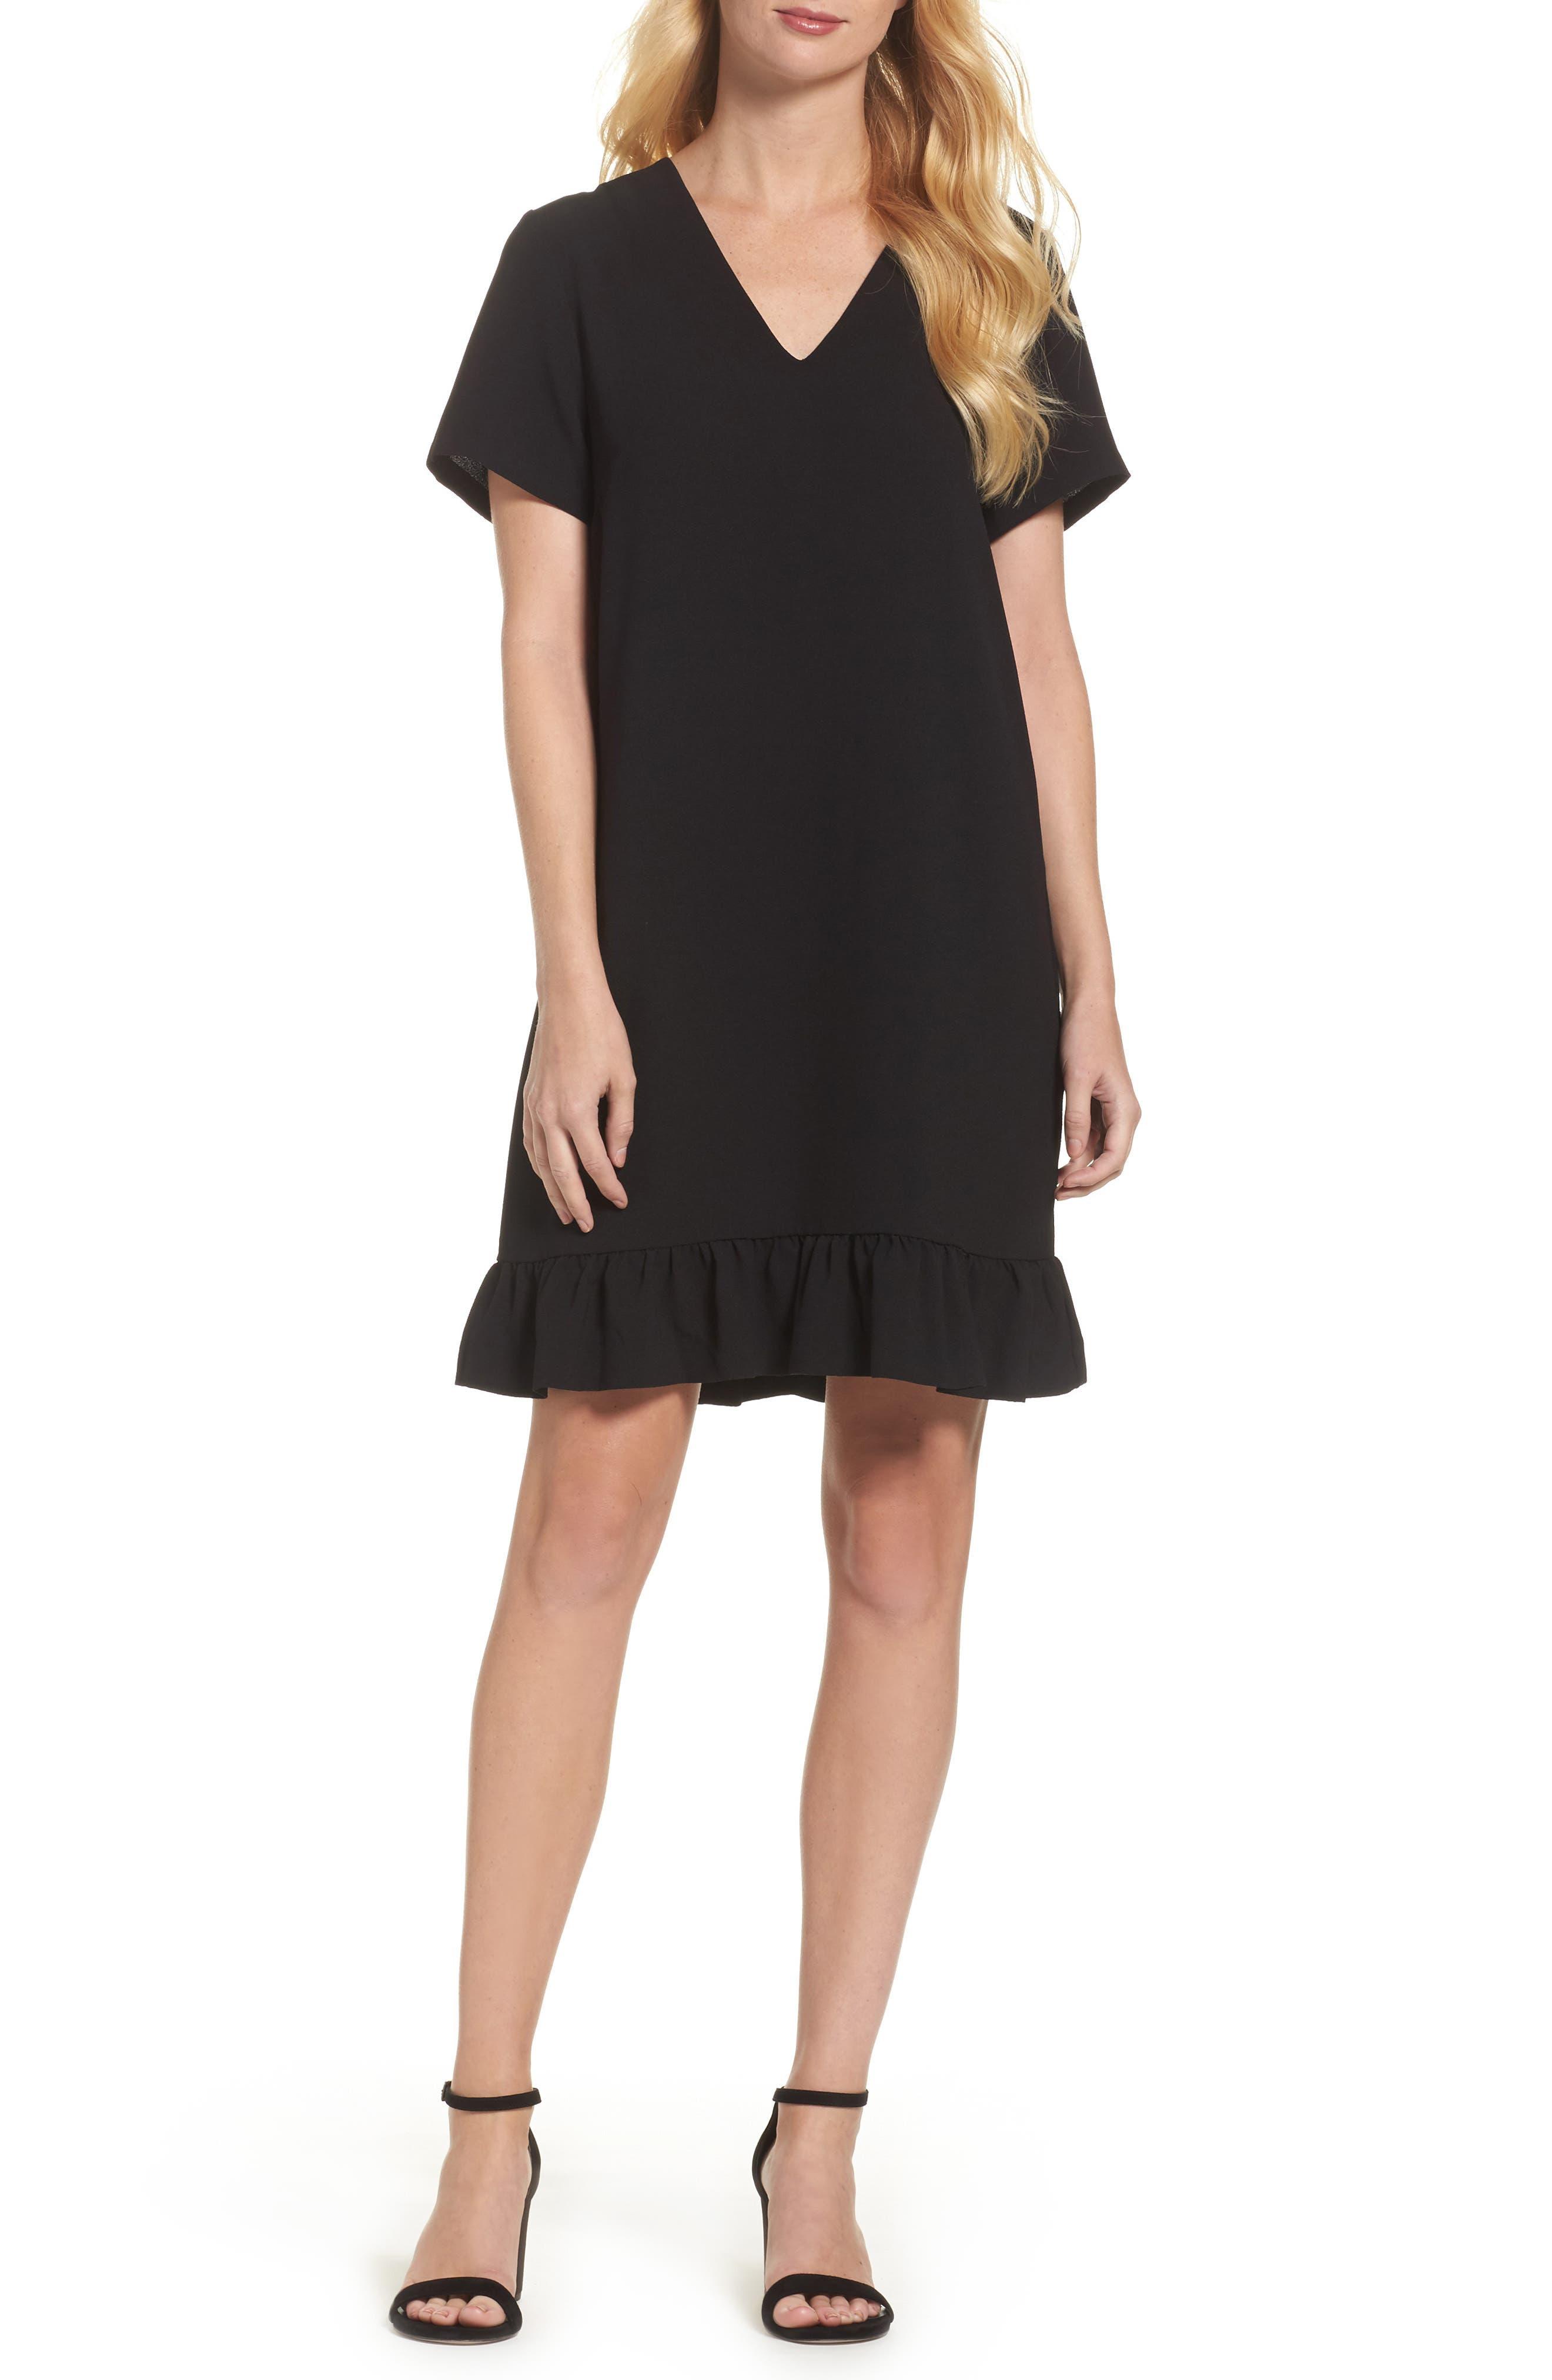 FELICITY & COCO Ruffle Shift Dress